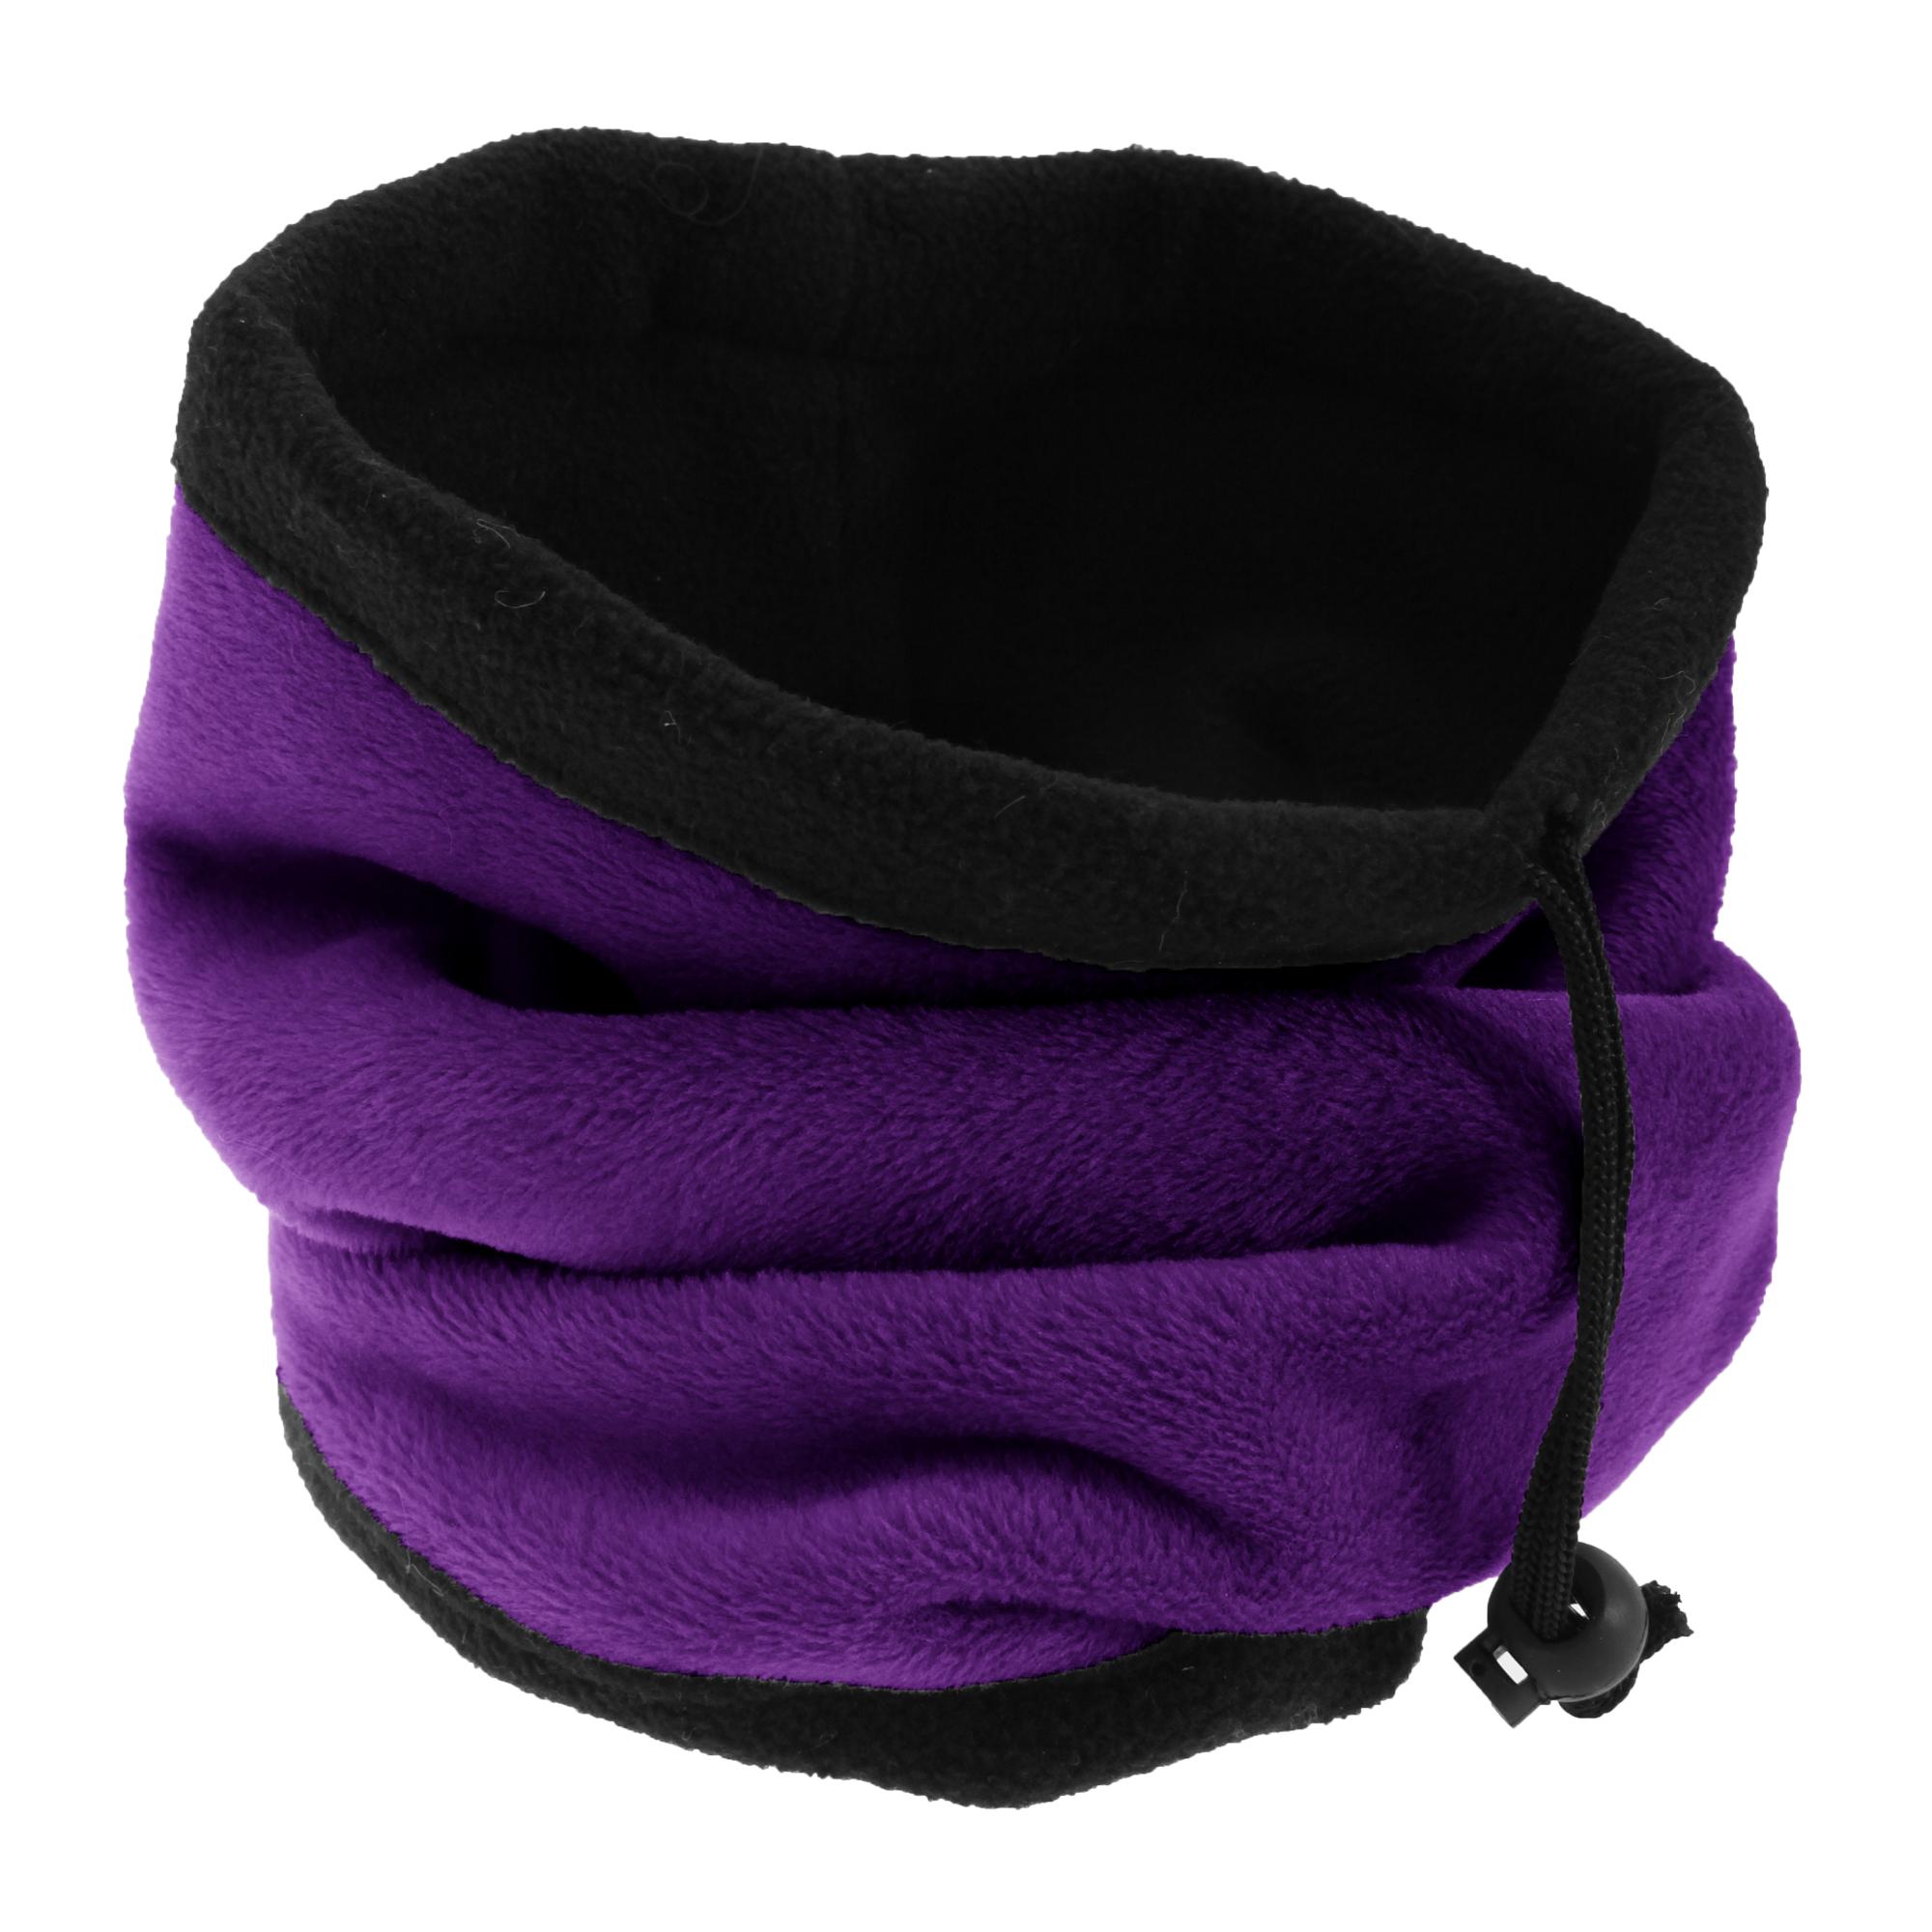 FLOSO Womens/Ladies Multipurpose Fleece Neckwarmer Snood / Hat (One Size) (Purple)